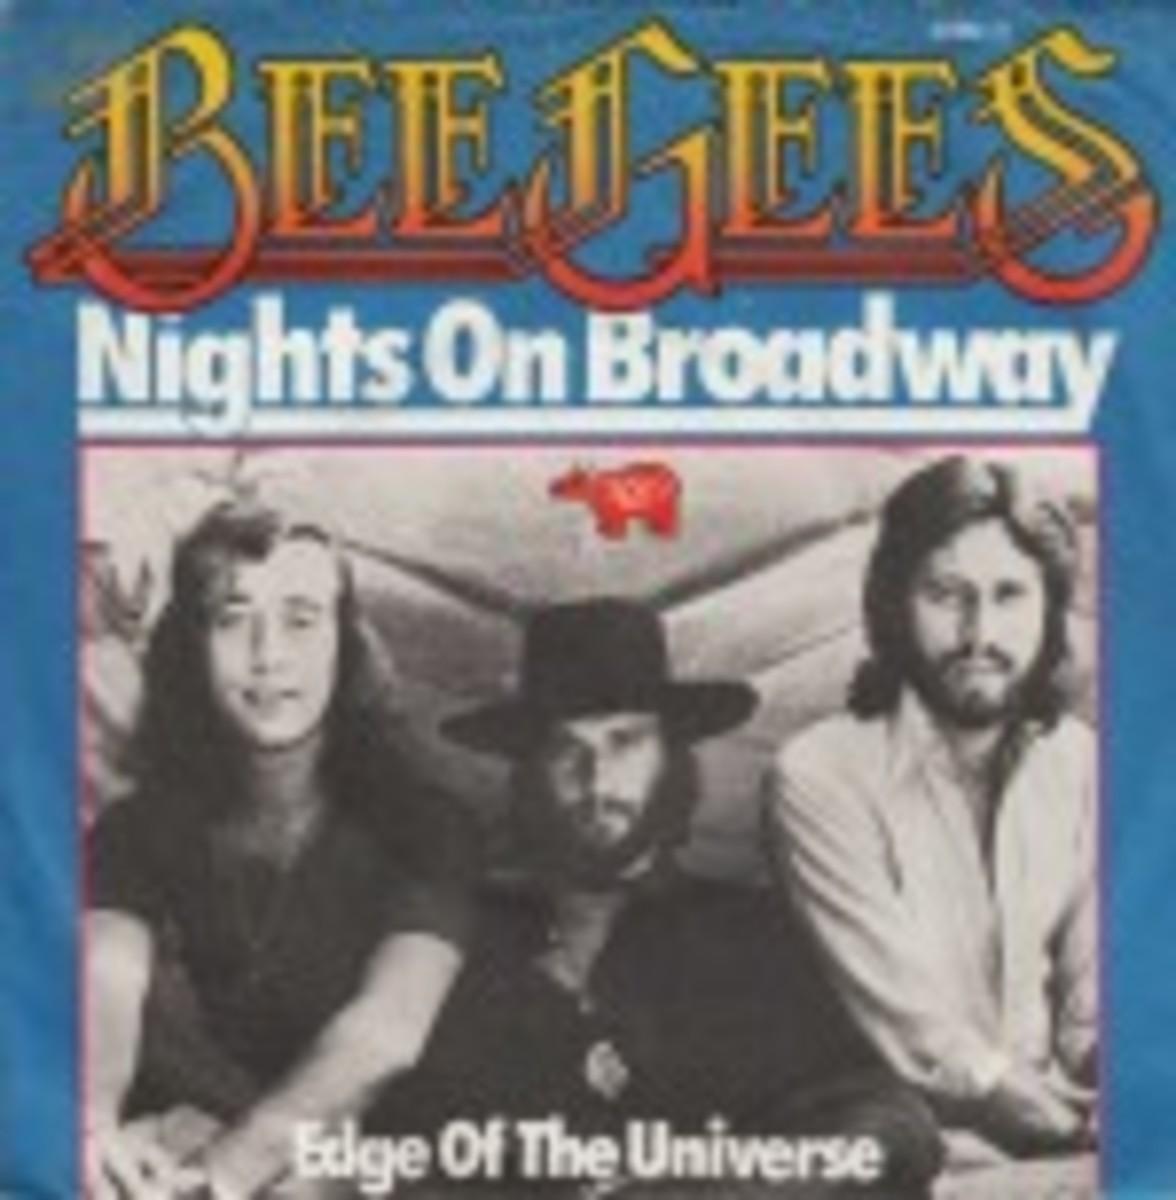 BeeGees_NightsOnBroadway